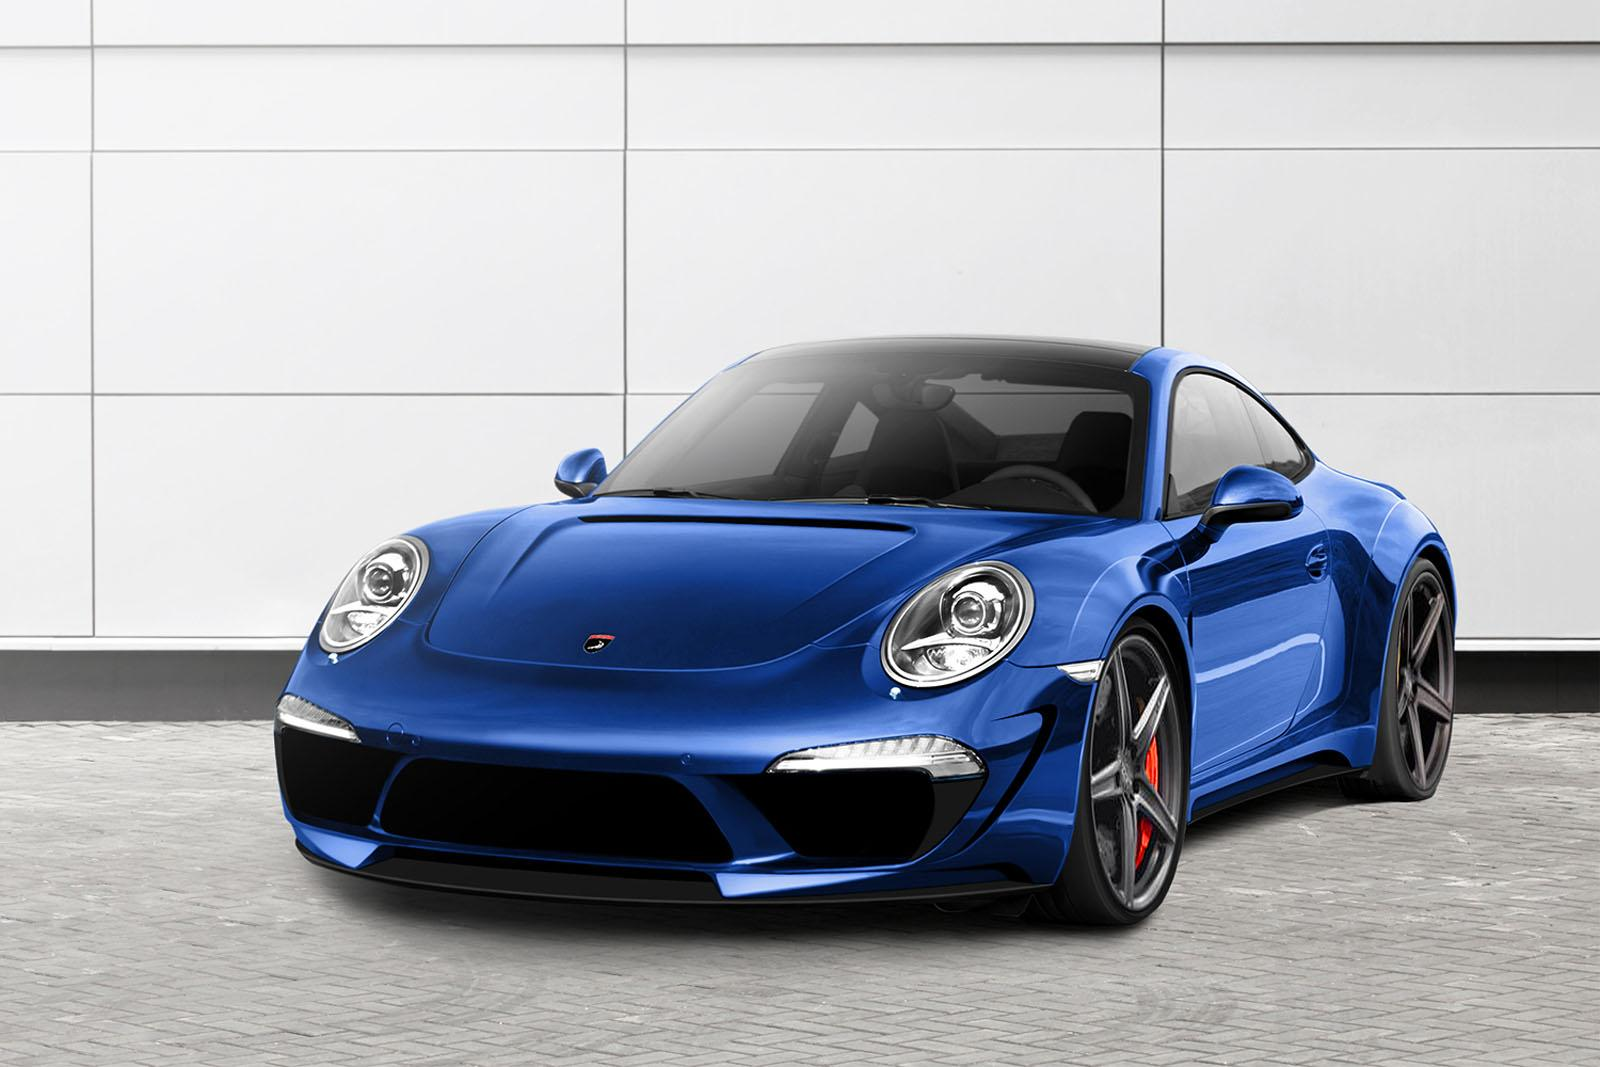 topcar porsche 911 carrera 4 preview autoevolution. Black Bedroom Furniture Sets. Home Design Ideas